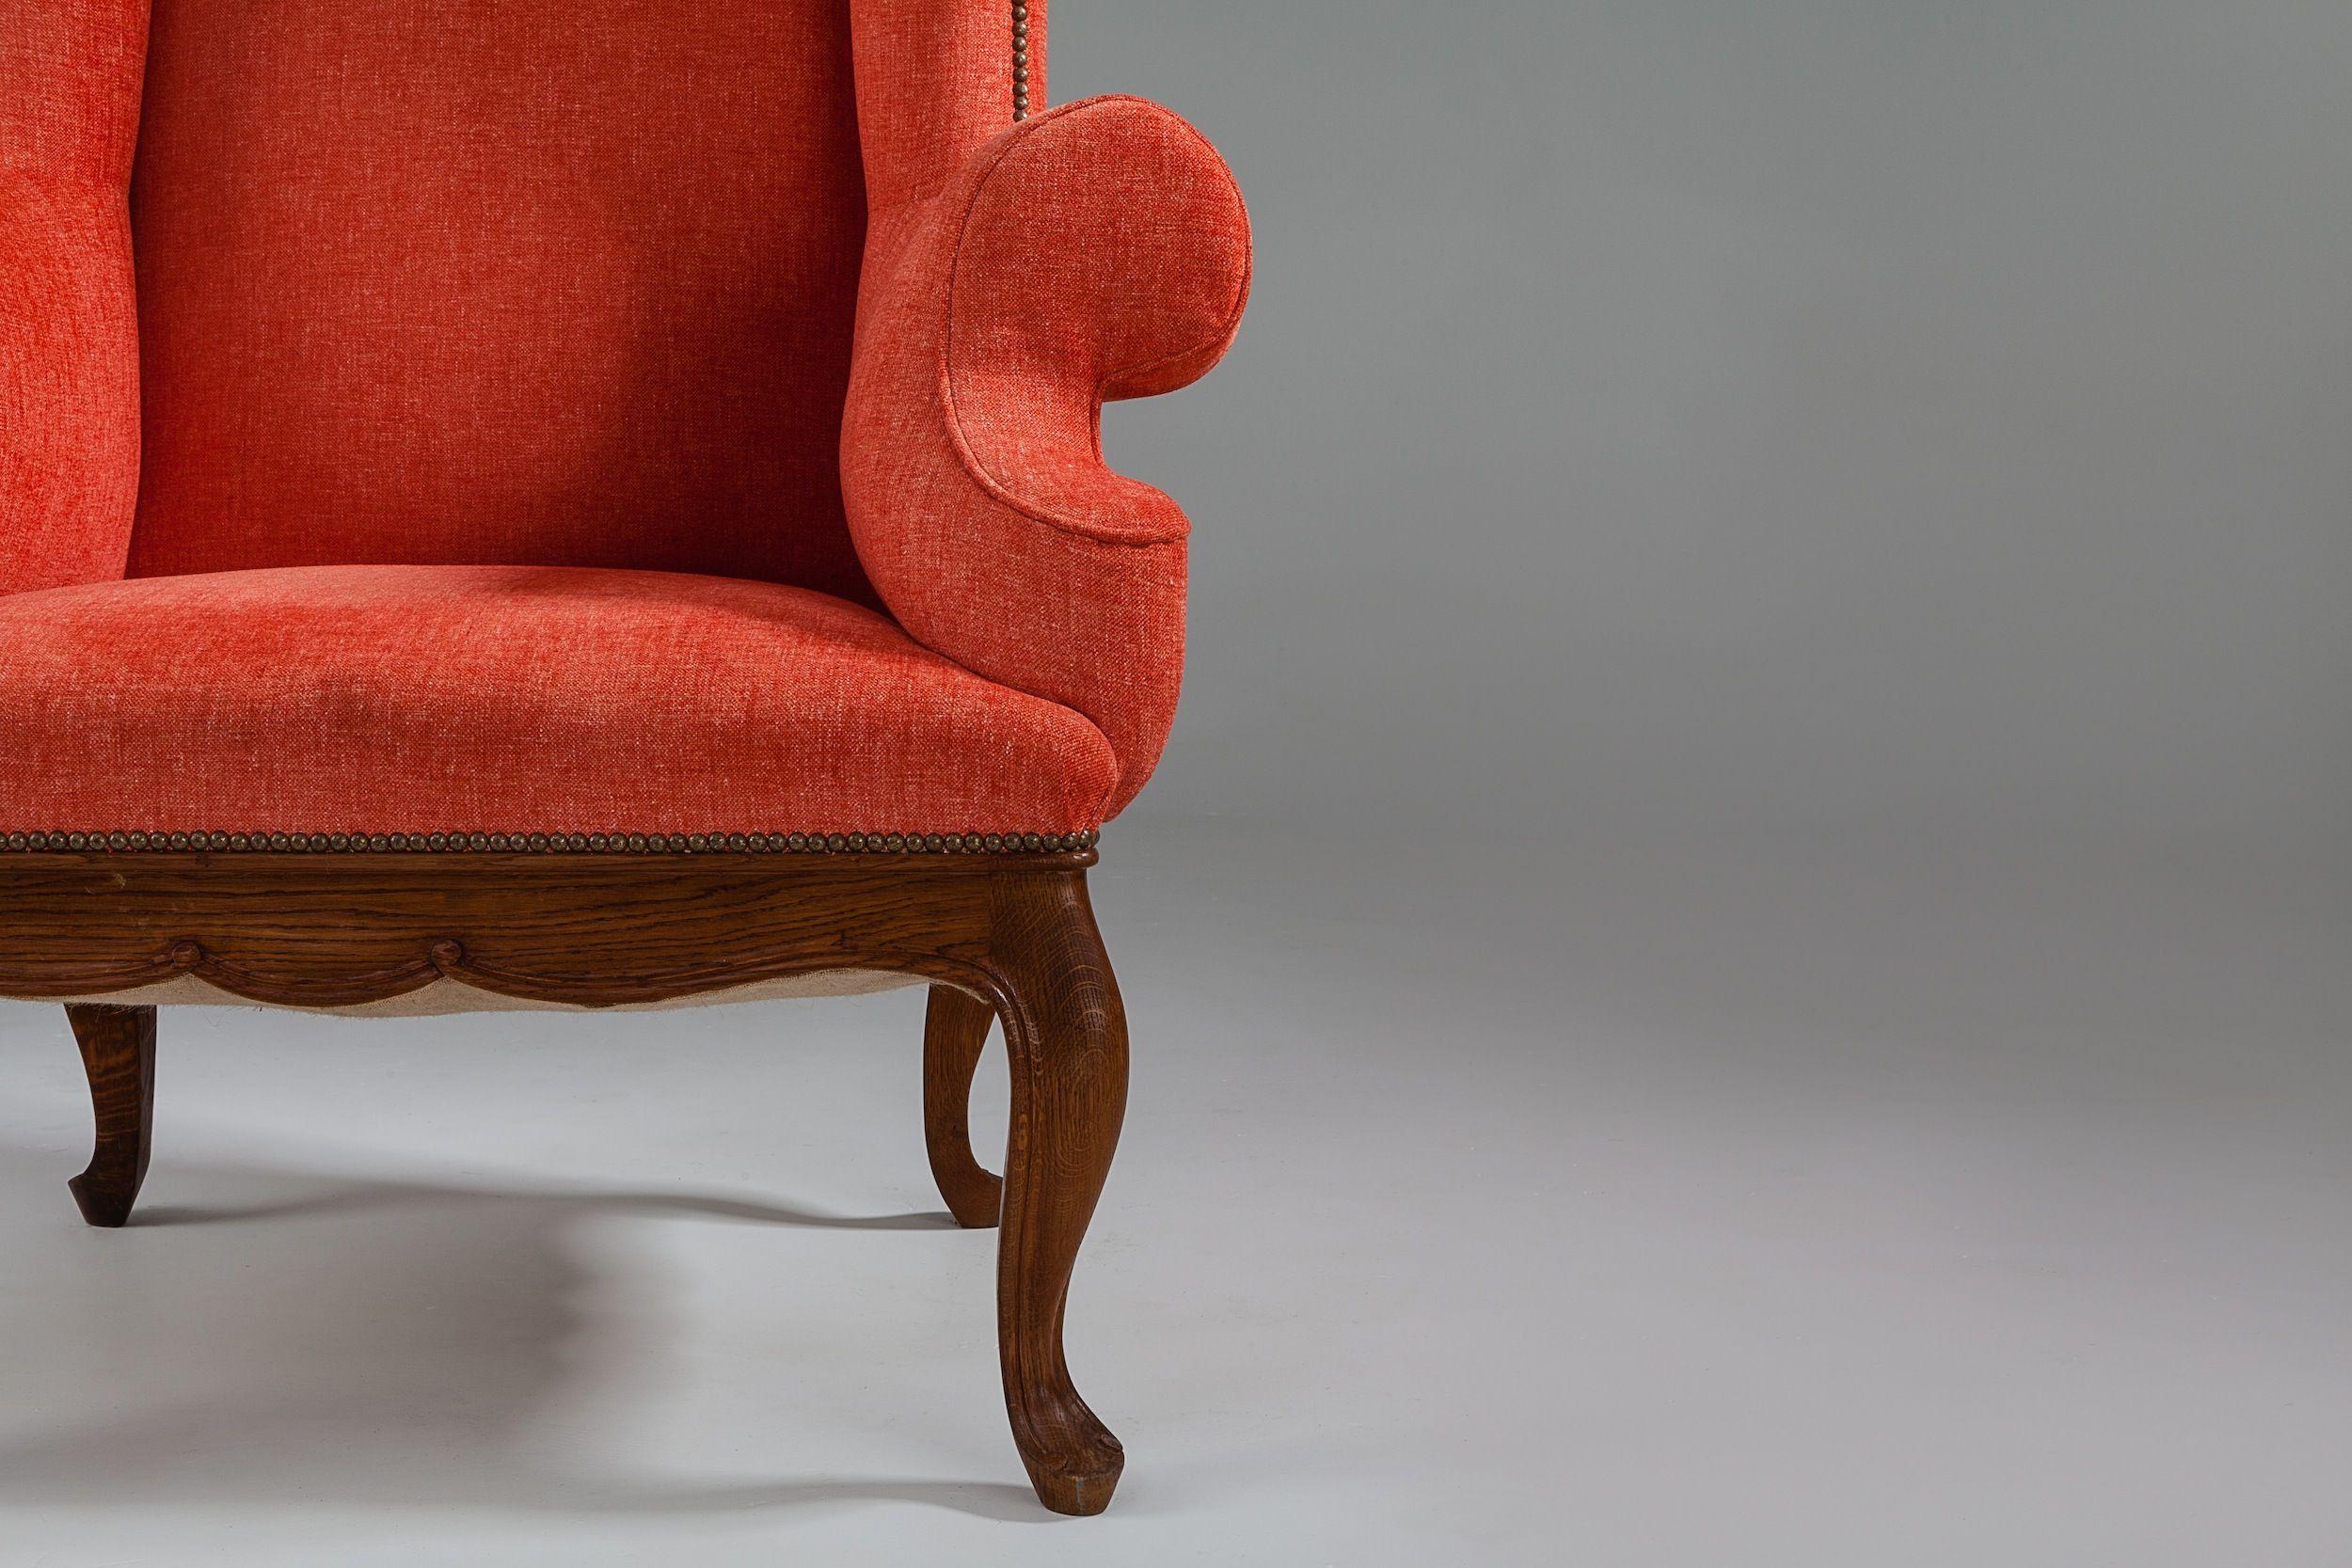 French oak wing chair wing chair french oak chair